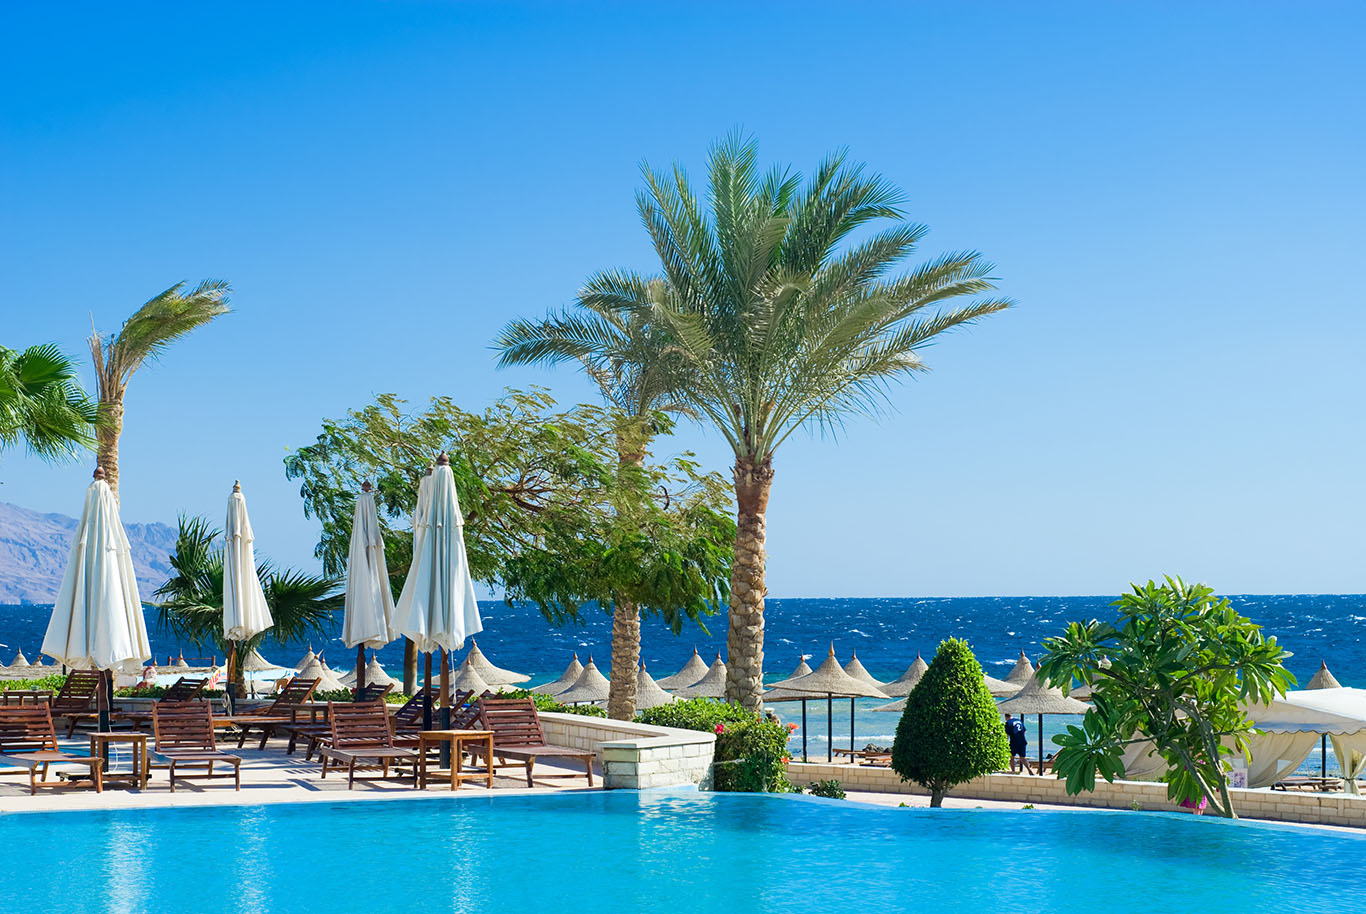 Aegypten-Sharm-el-Sheikh-Hotels-and-reosrt